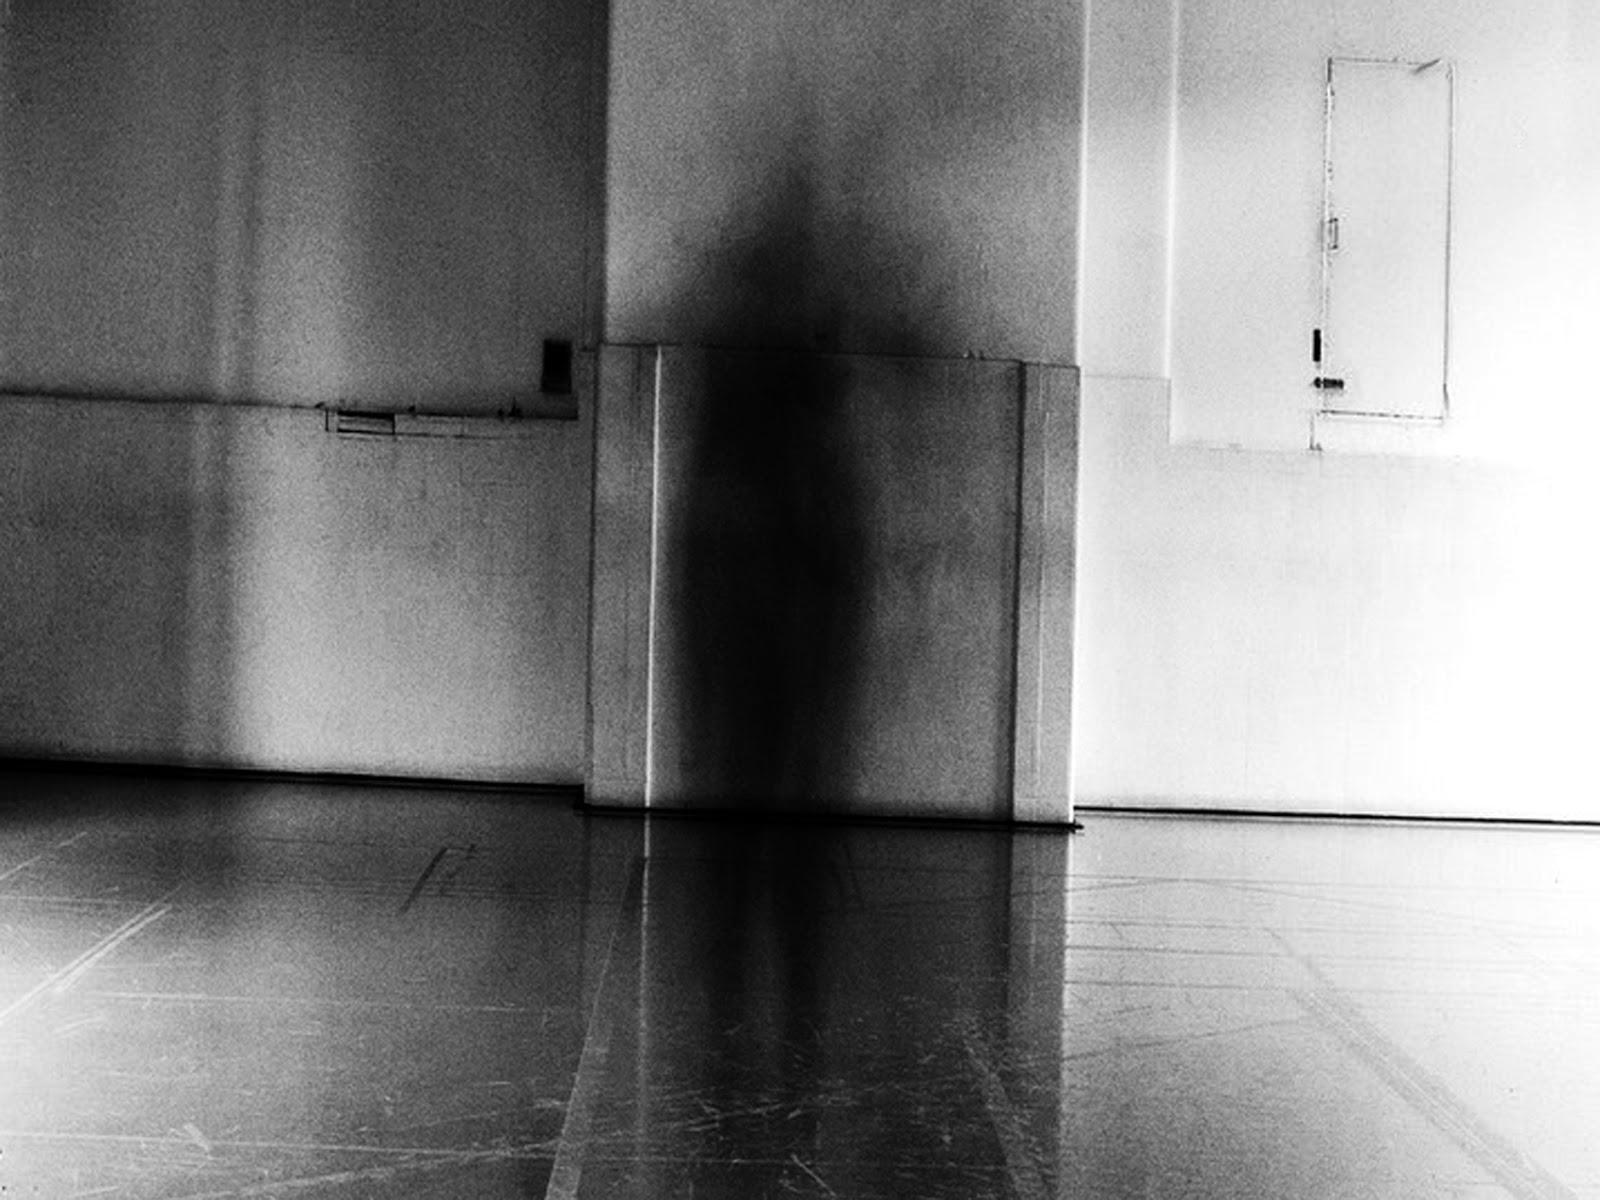 ghost dances themes essay